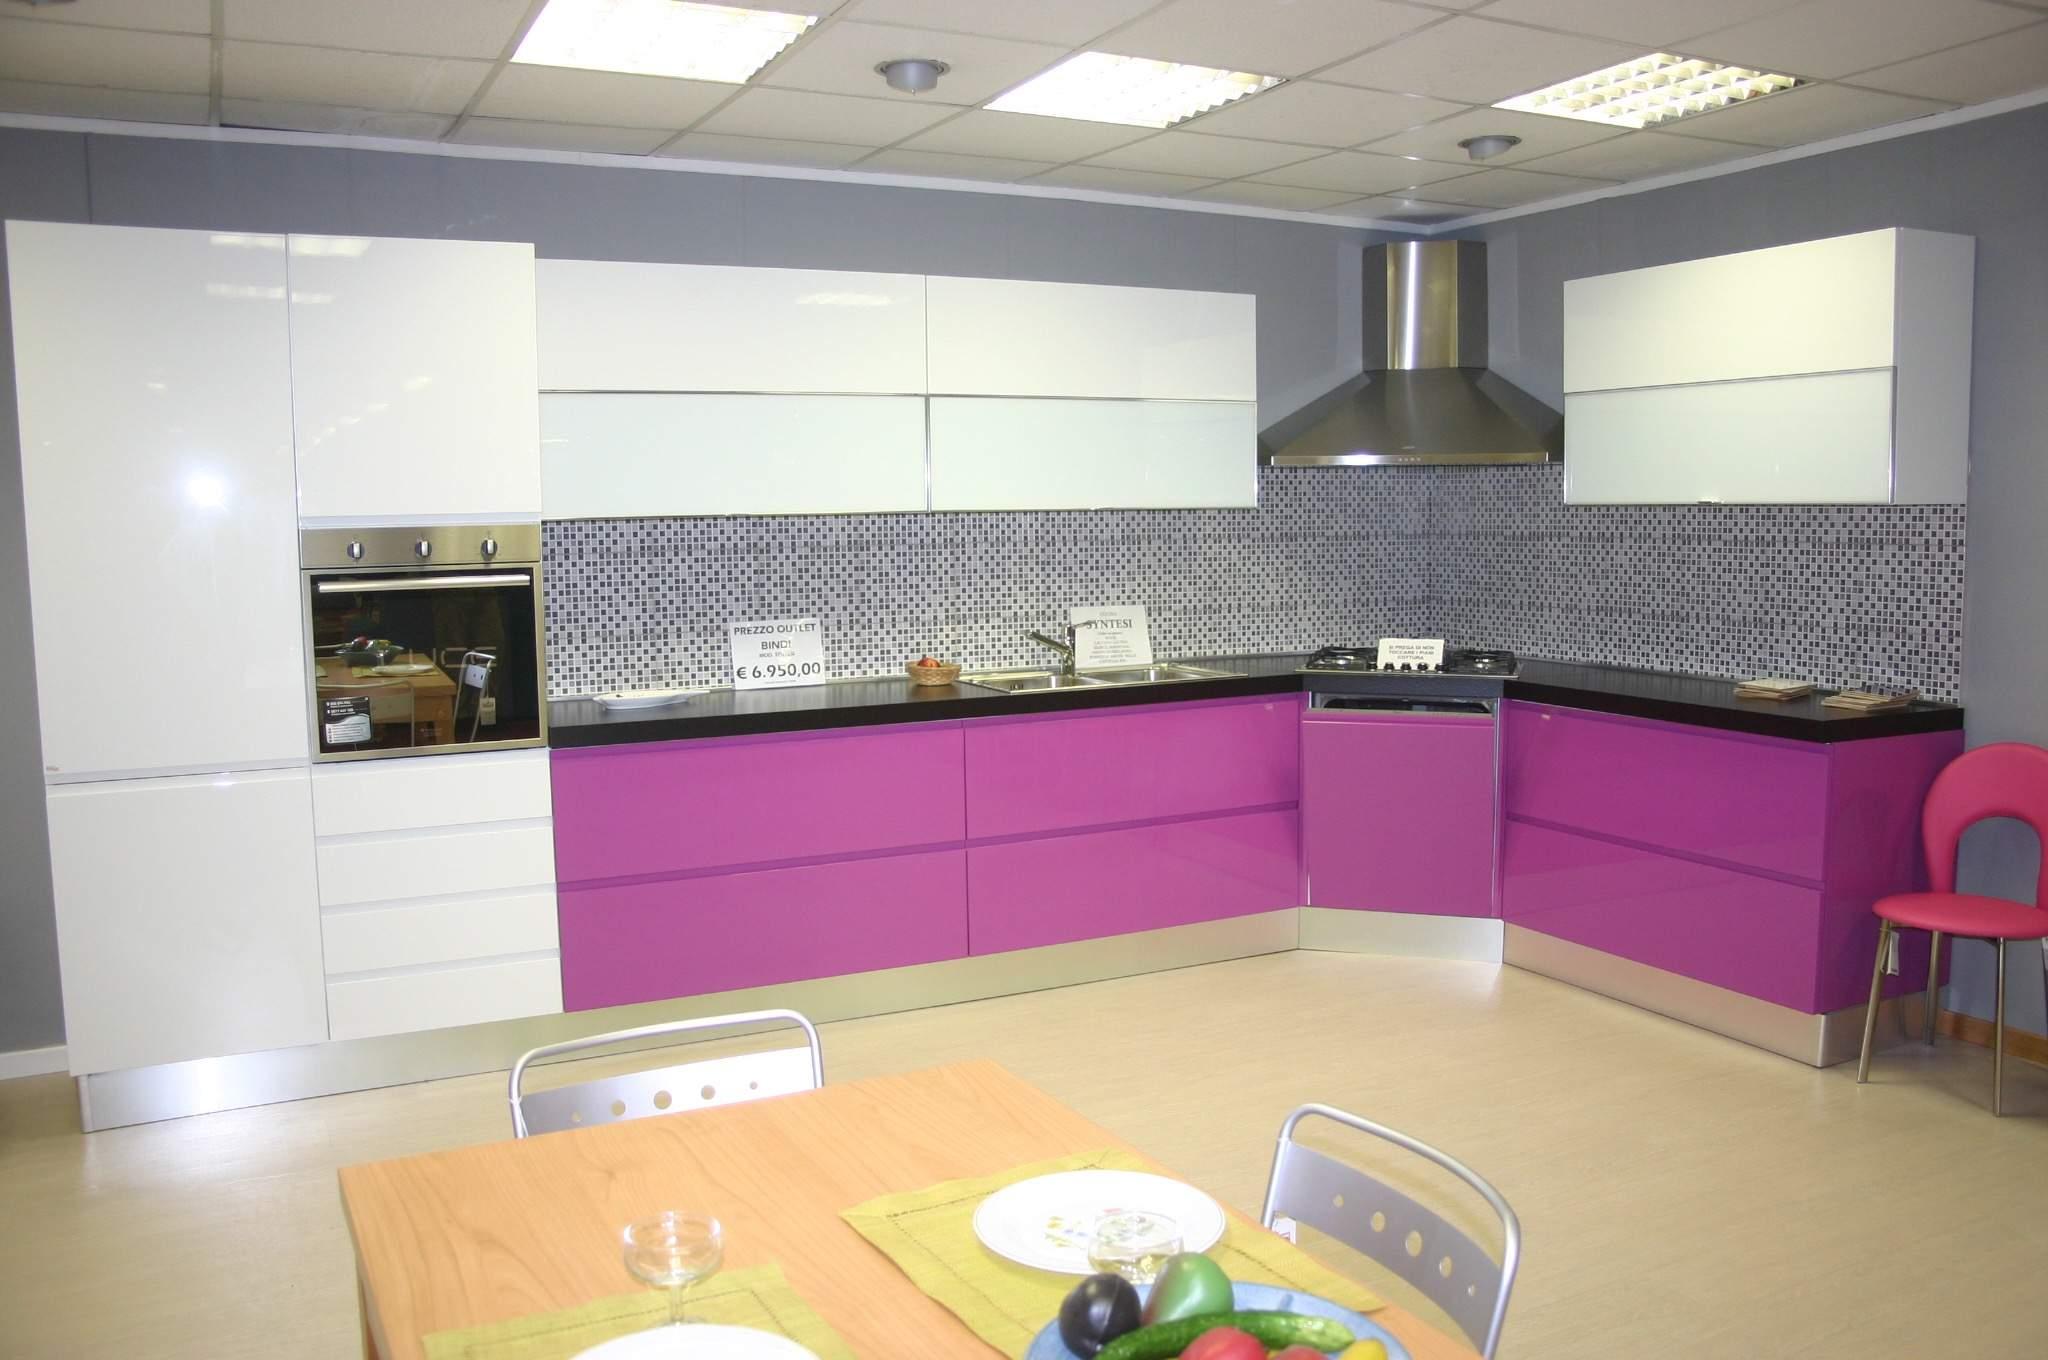 Outlet cucine e arredamento piacentini arredamenti